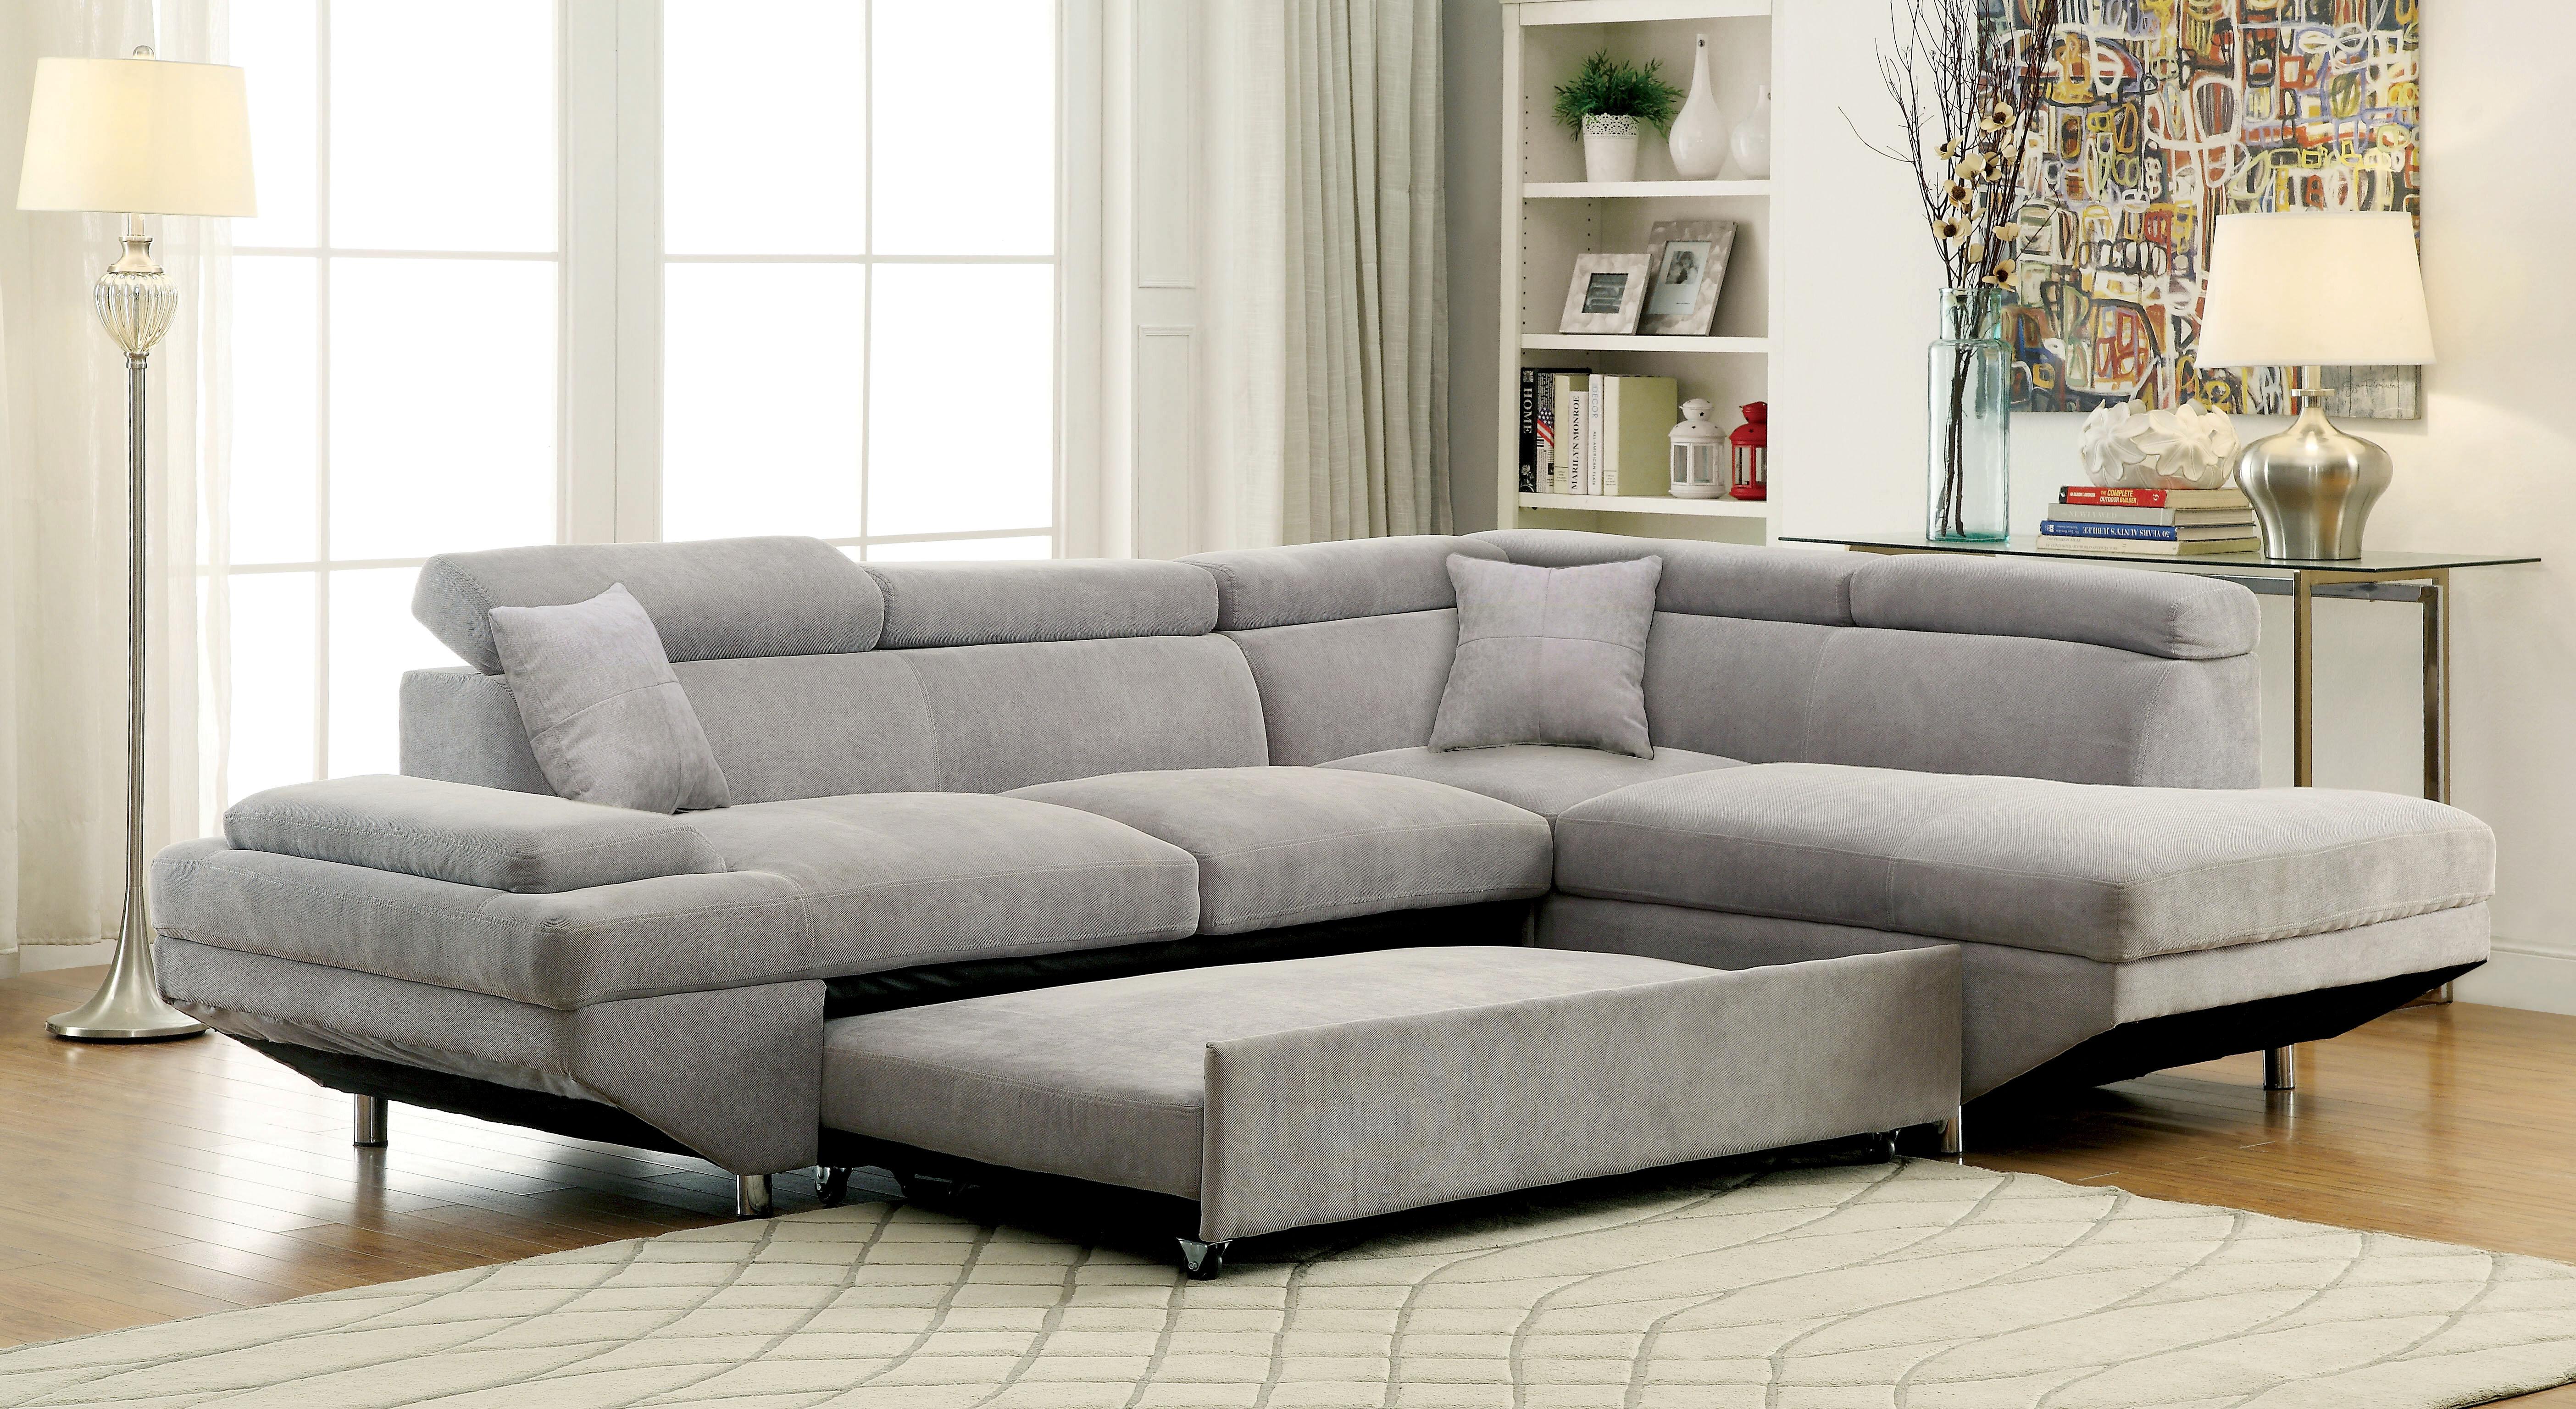 chaise furniture sectional sleeper wayfair pdx orren reversible paulin ellis